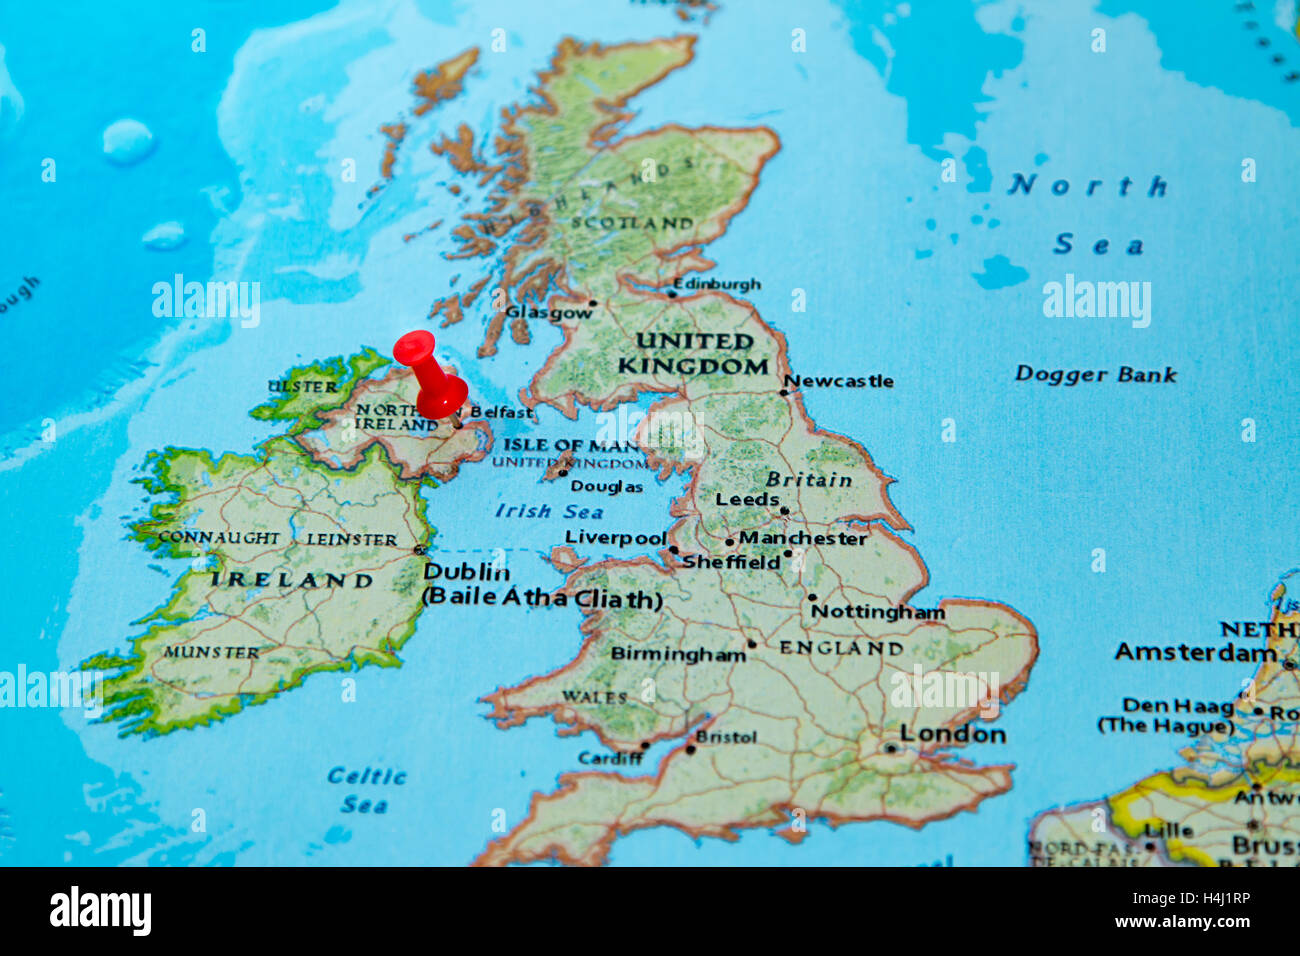 Belfast Northern Ireland UK Pinned On A Map Of Europe Stock - Ireland on map